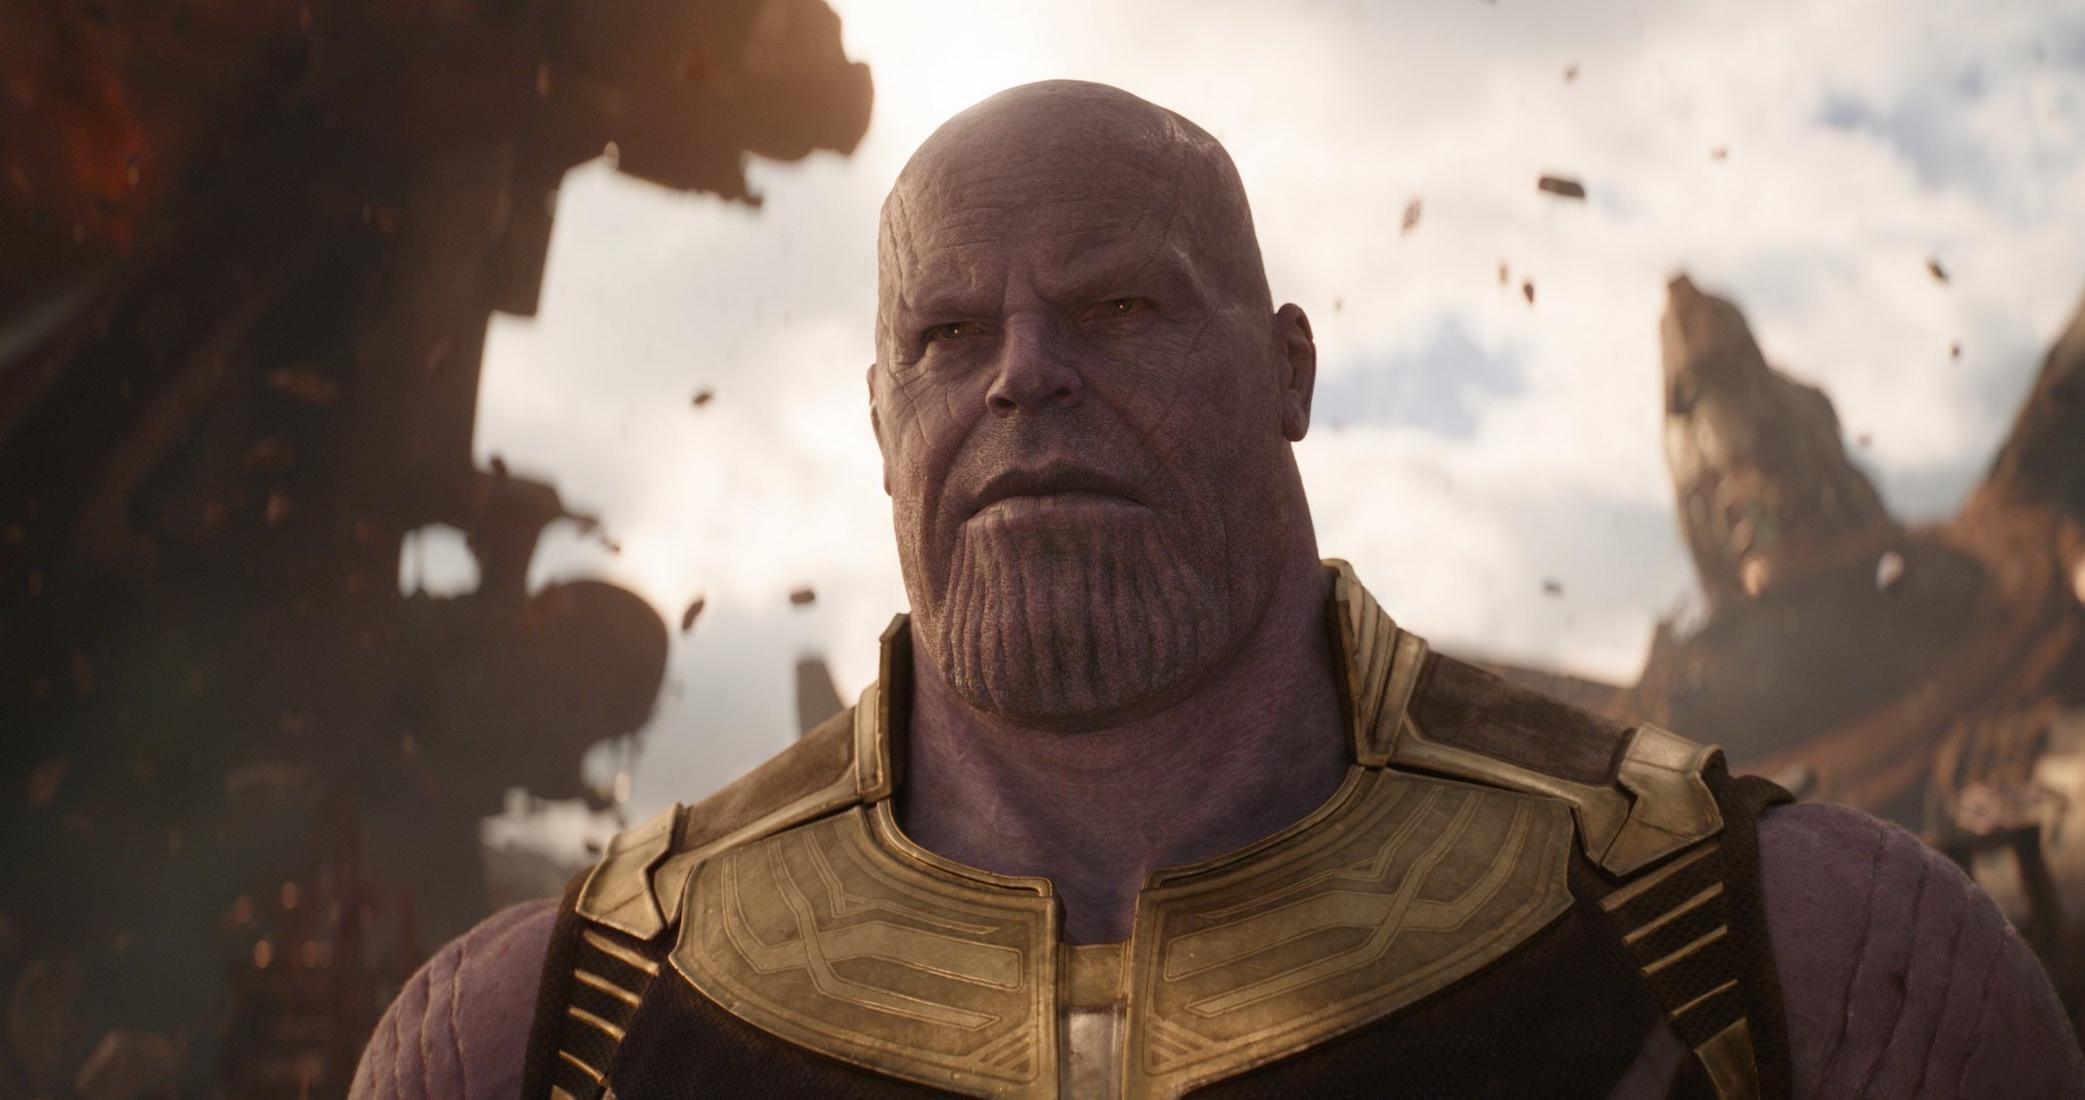 1920x1080 Josh Brolin As Thanos In Avengers Infinity War